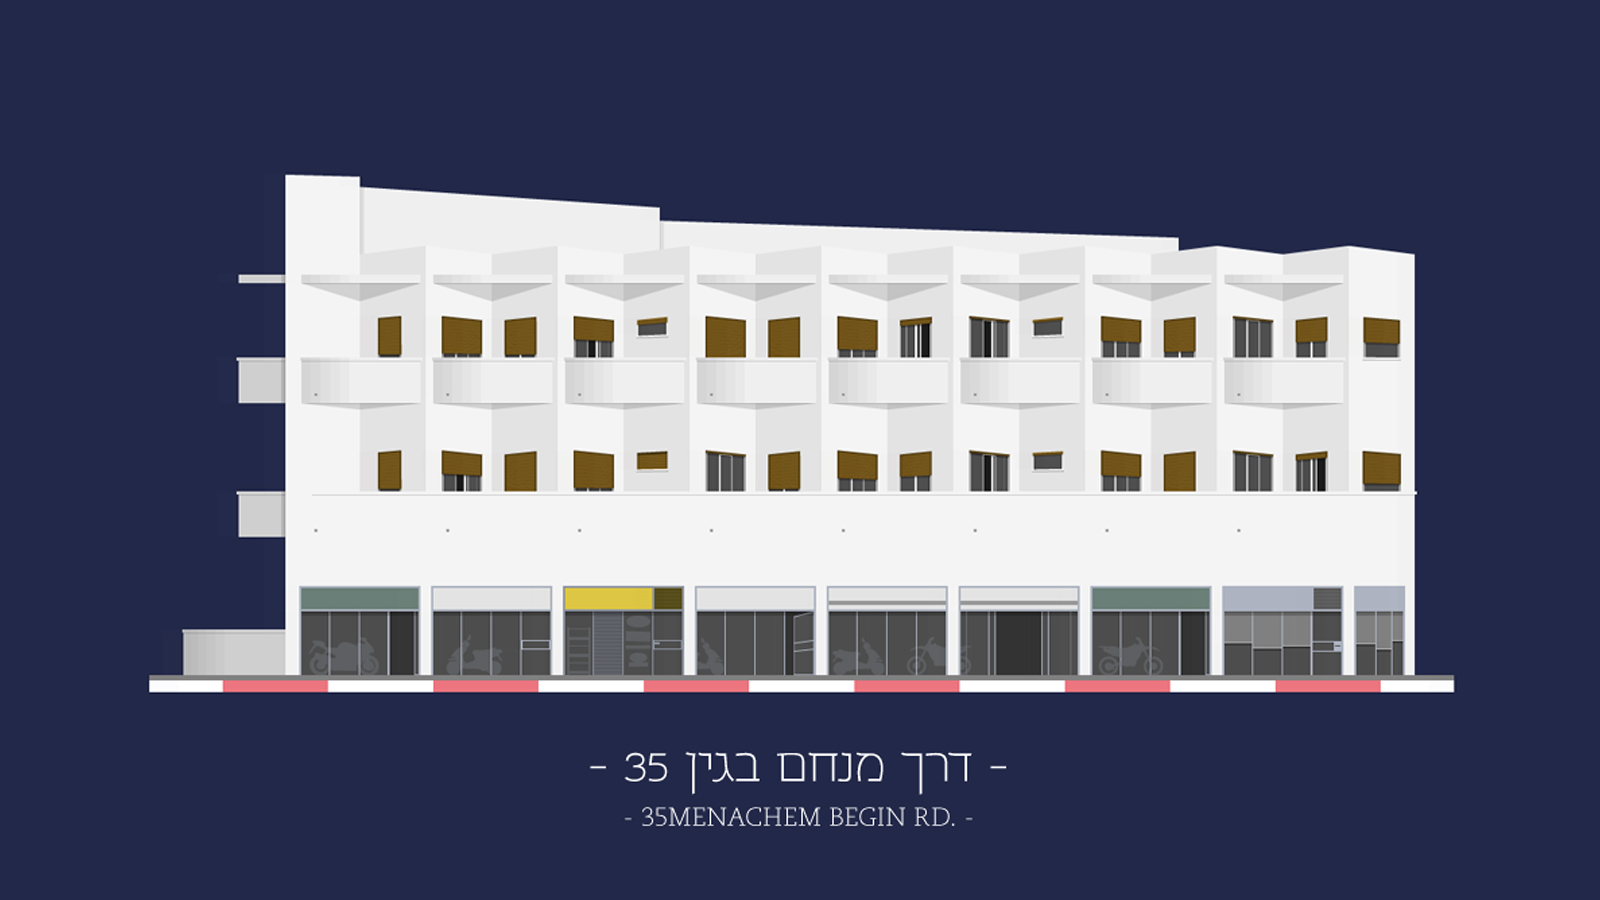 tel-aviv-buildings-5_1600x900